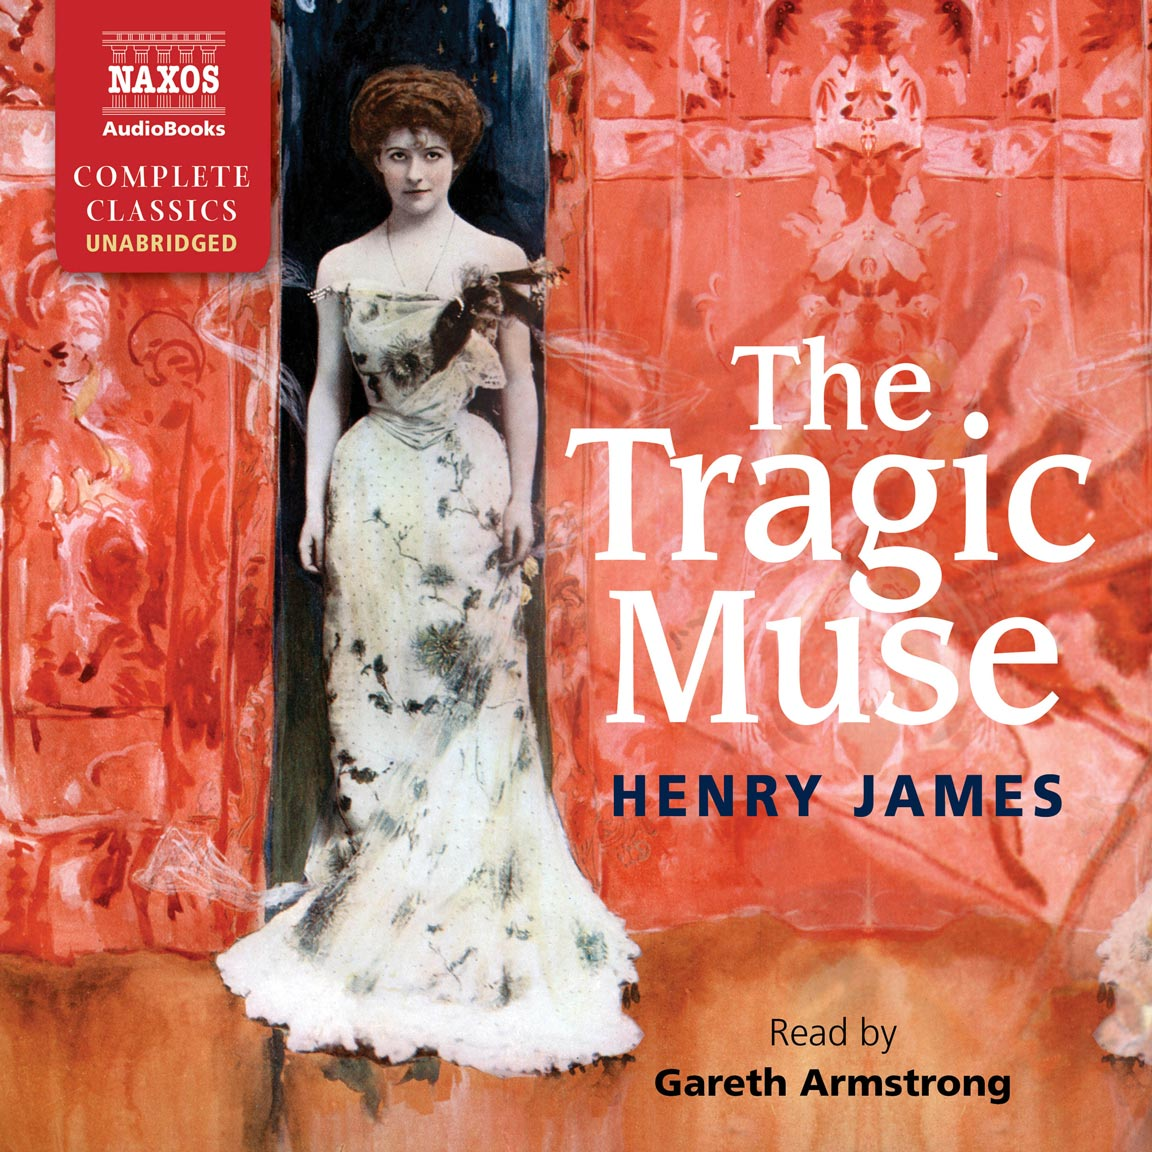 The Tragic Muse (unabridged)